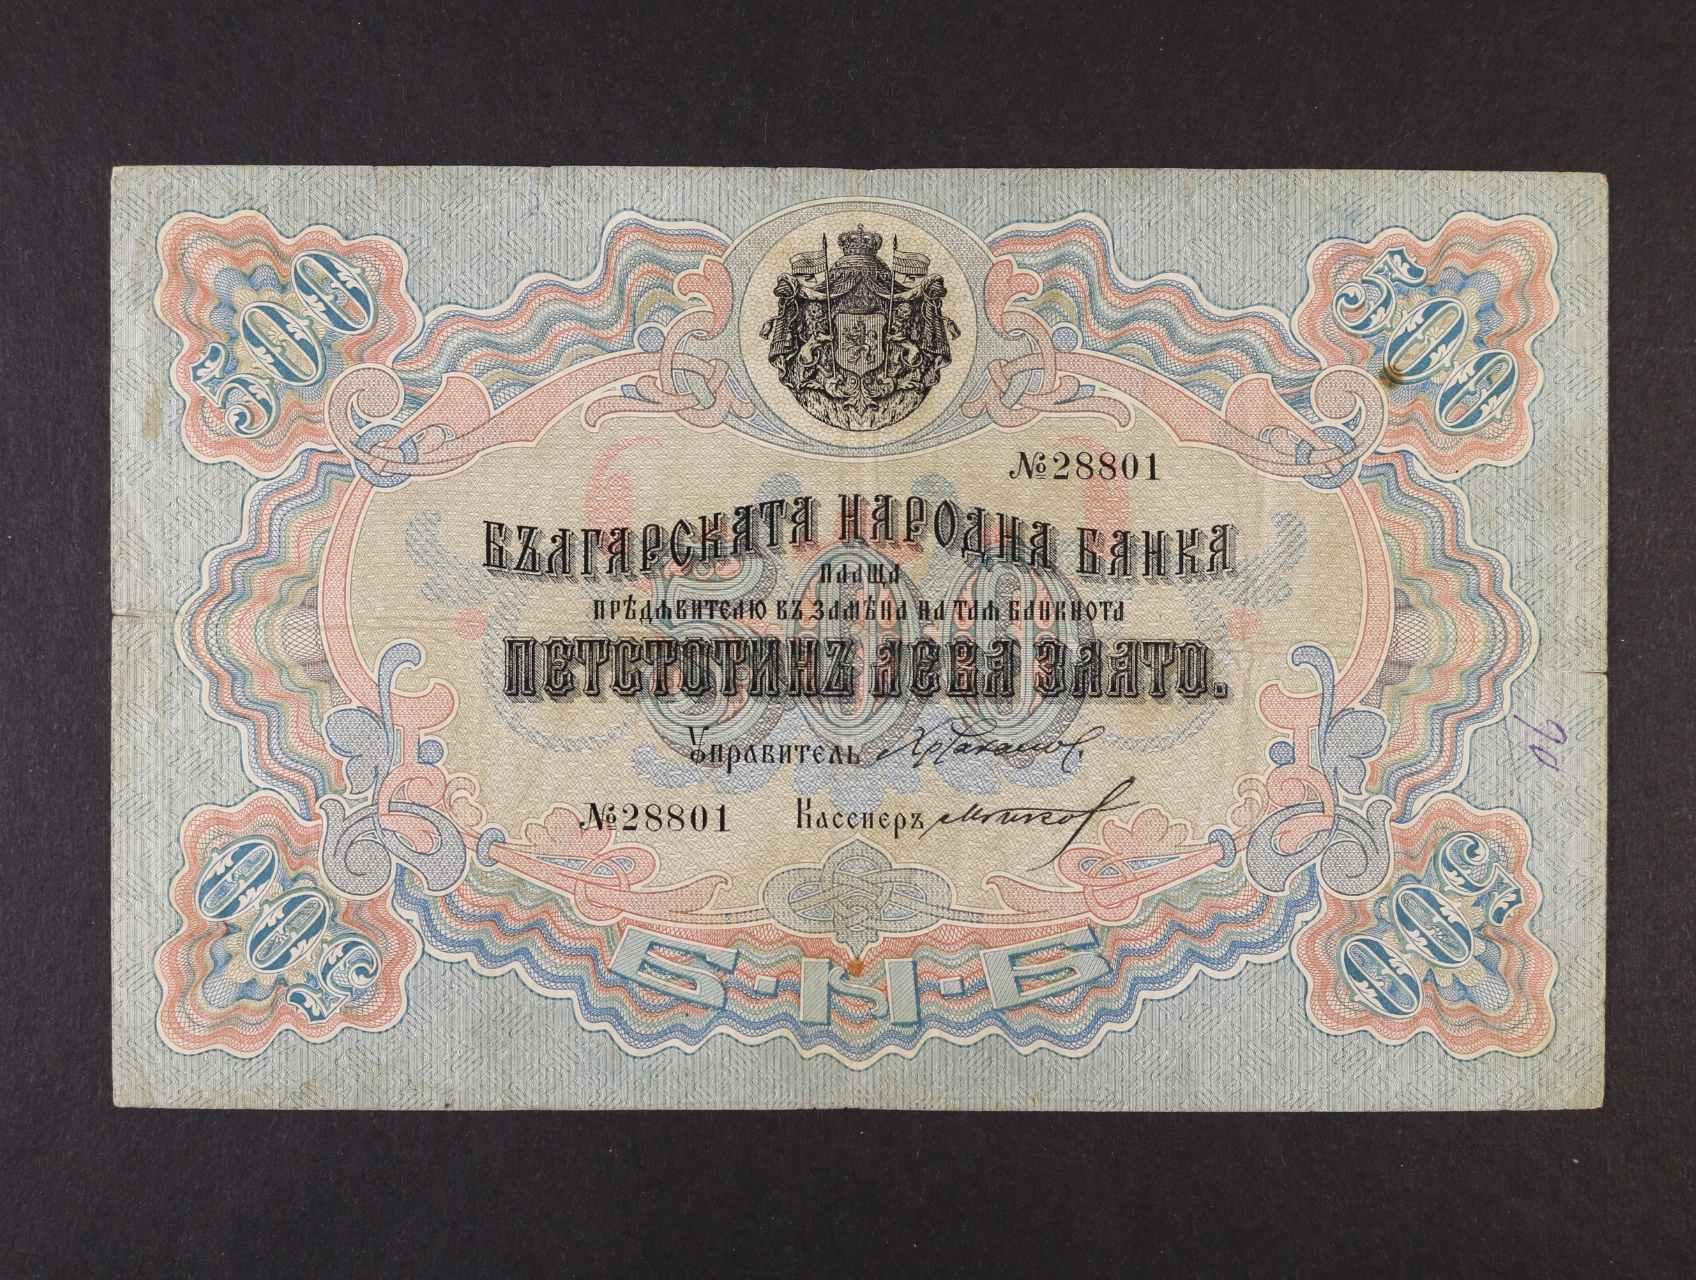 500 Leva Zlato b.d. (1907), Pi. 12c, vzácná